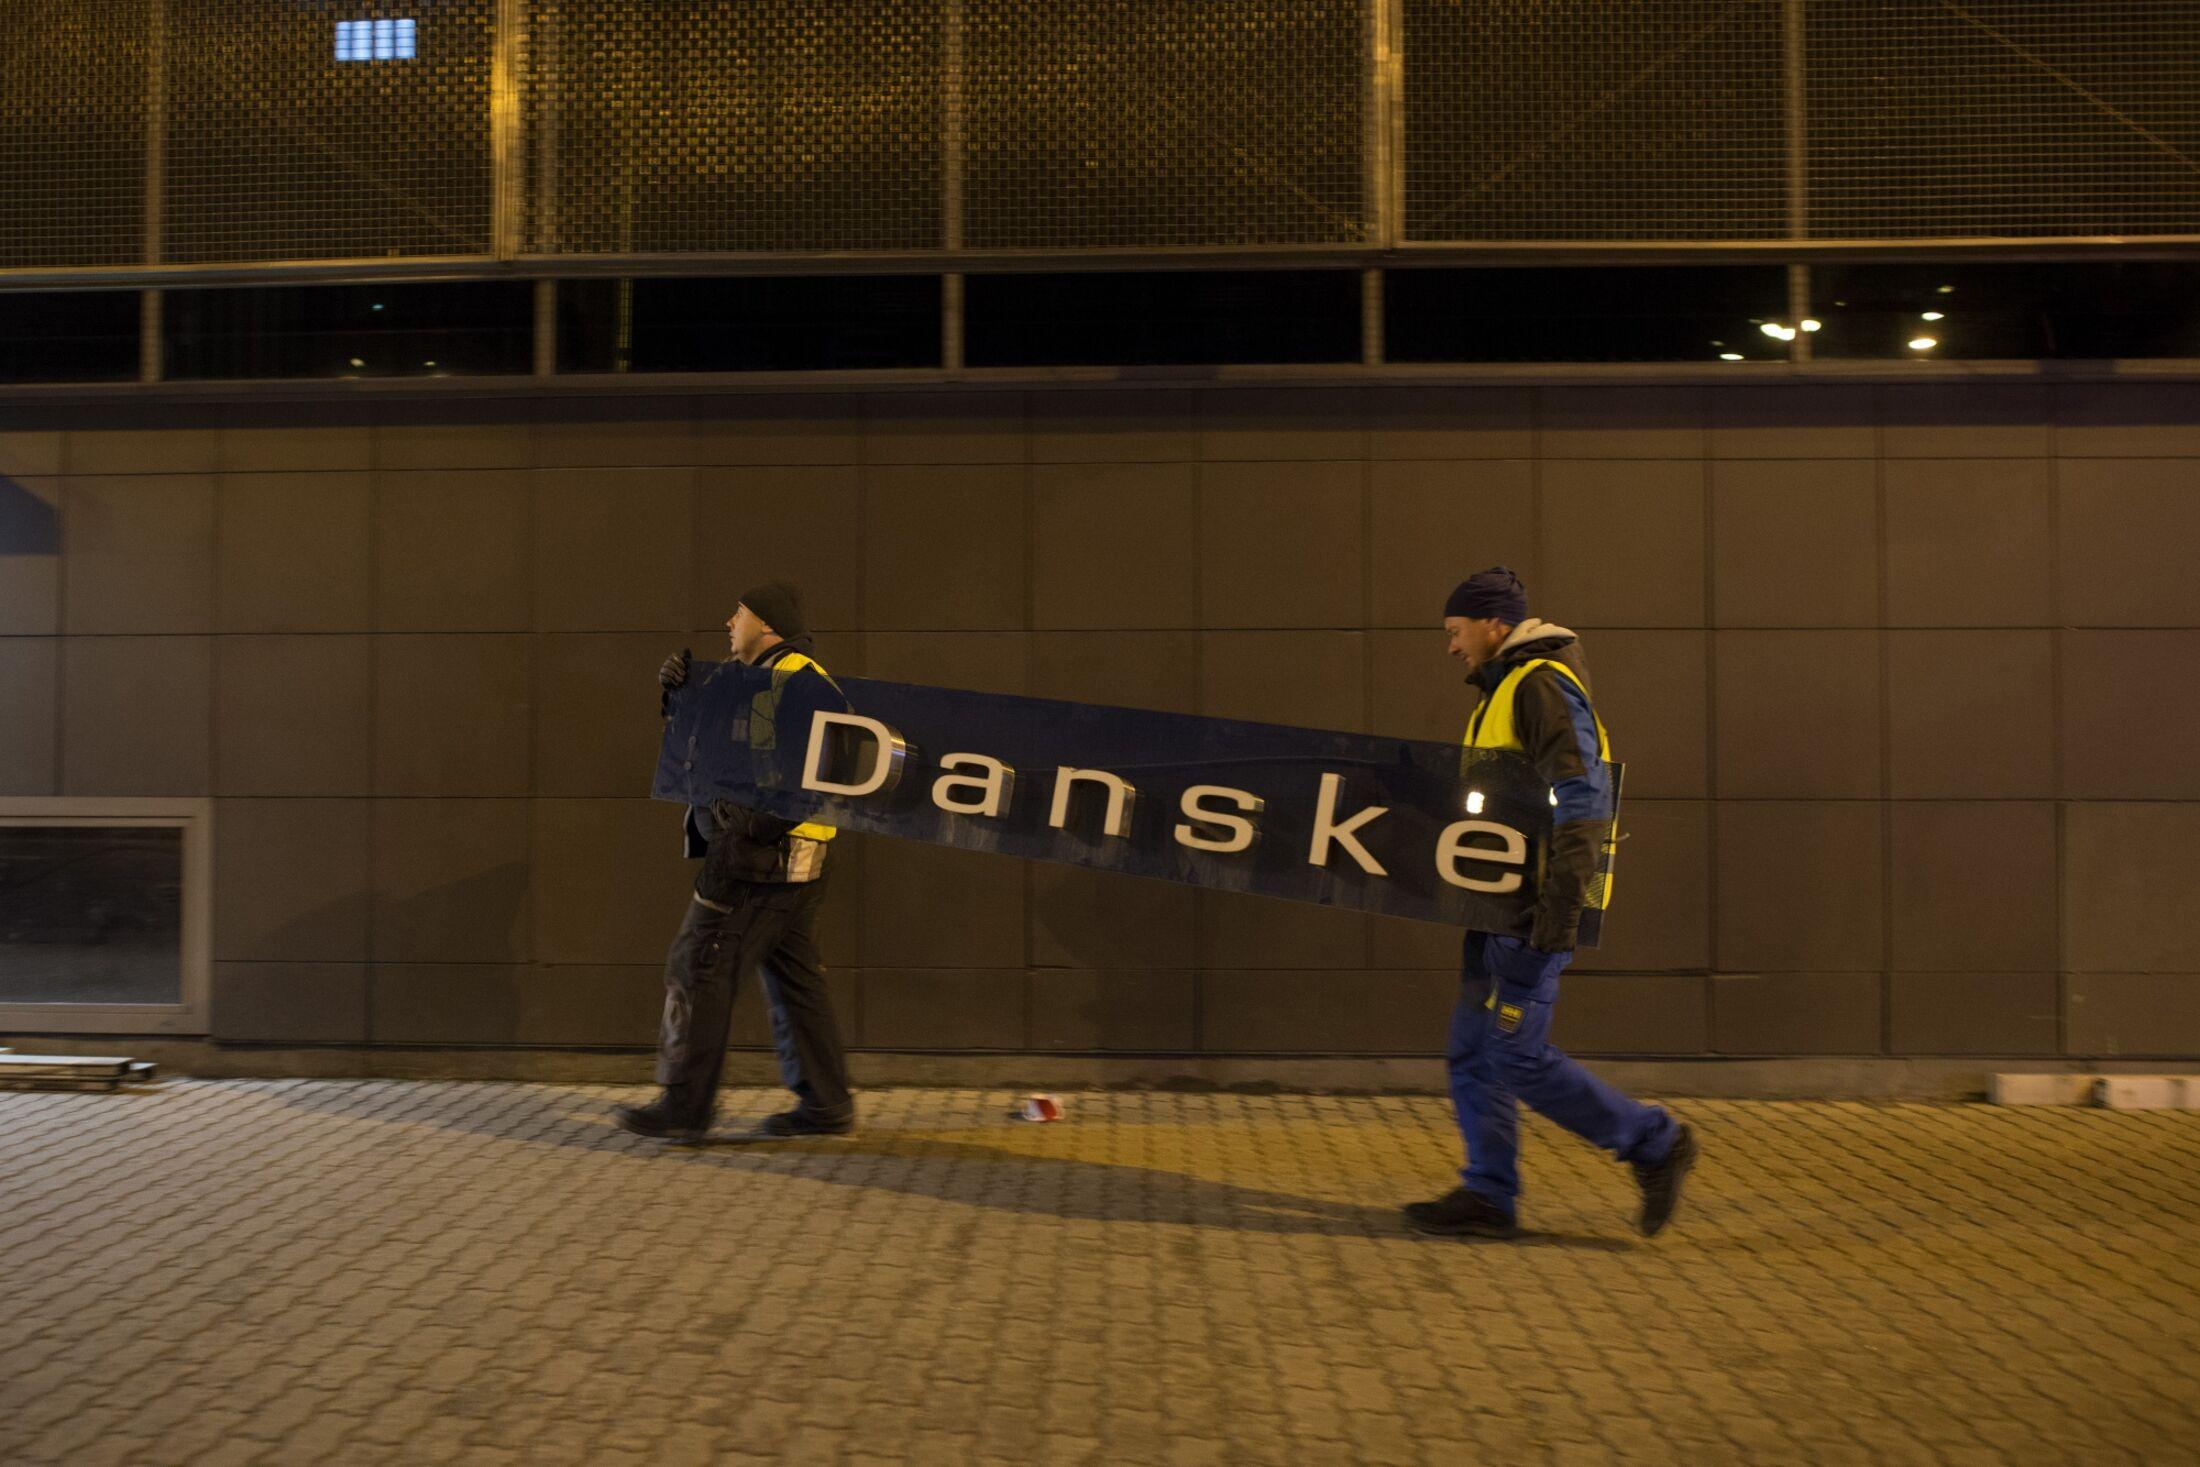 Workers remove Danske Bank signage in Estonia